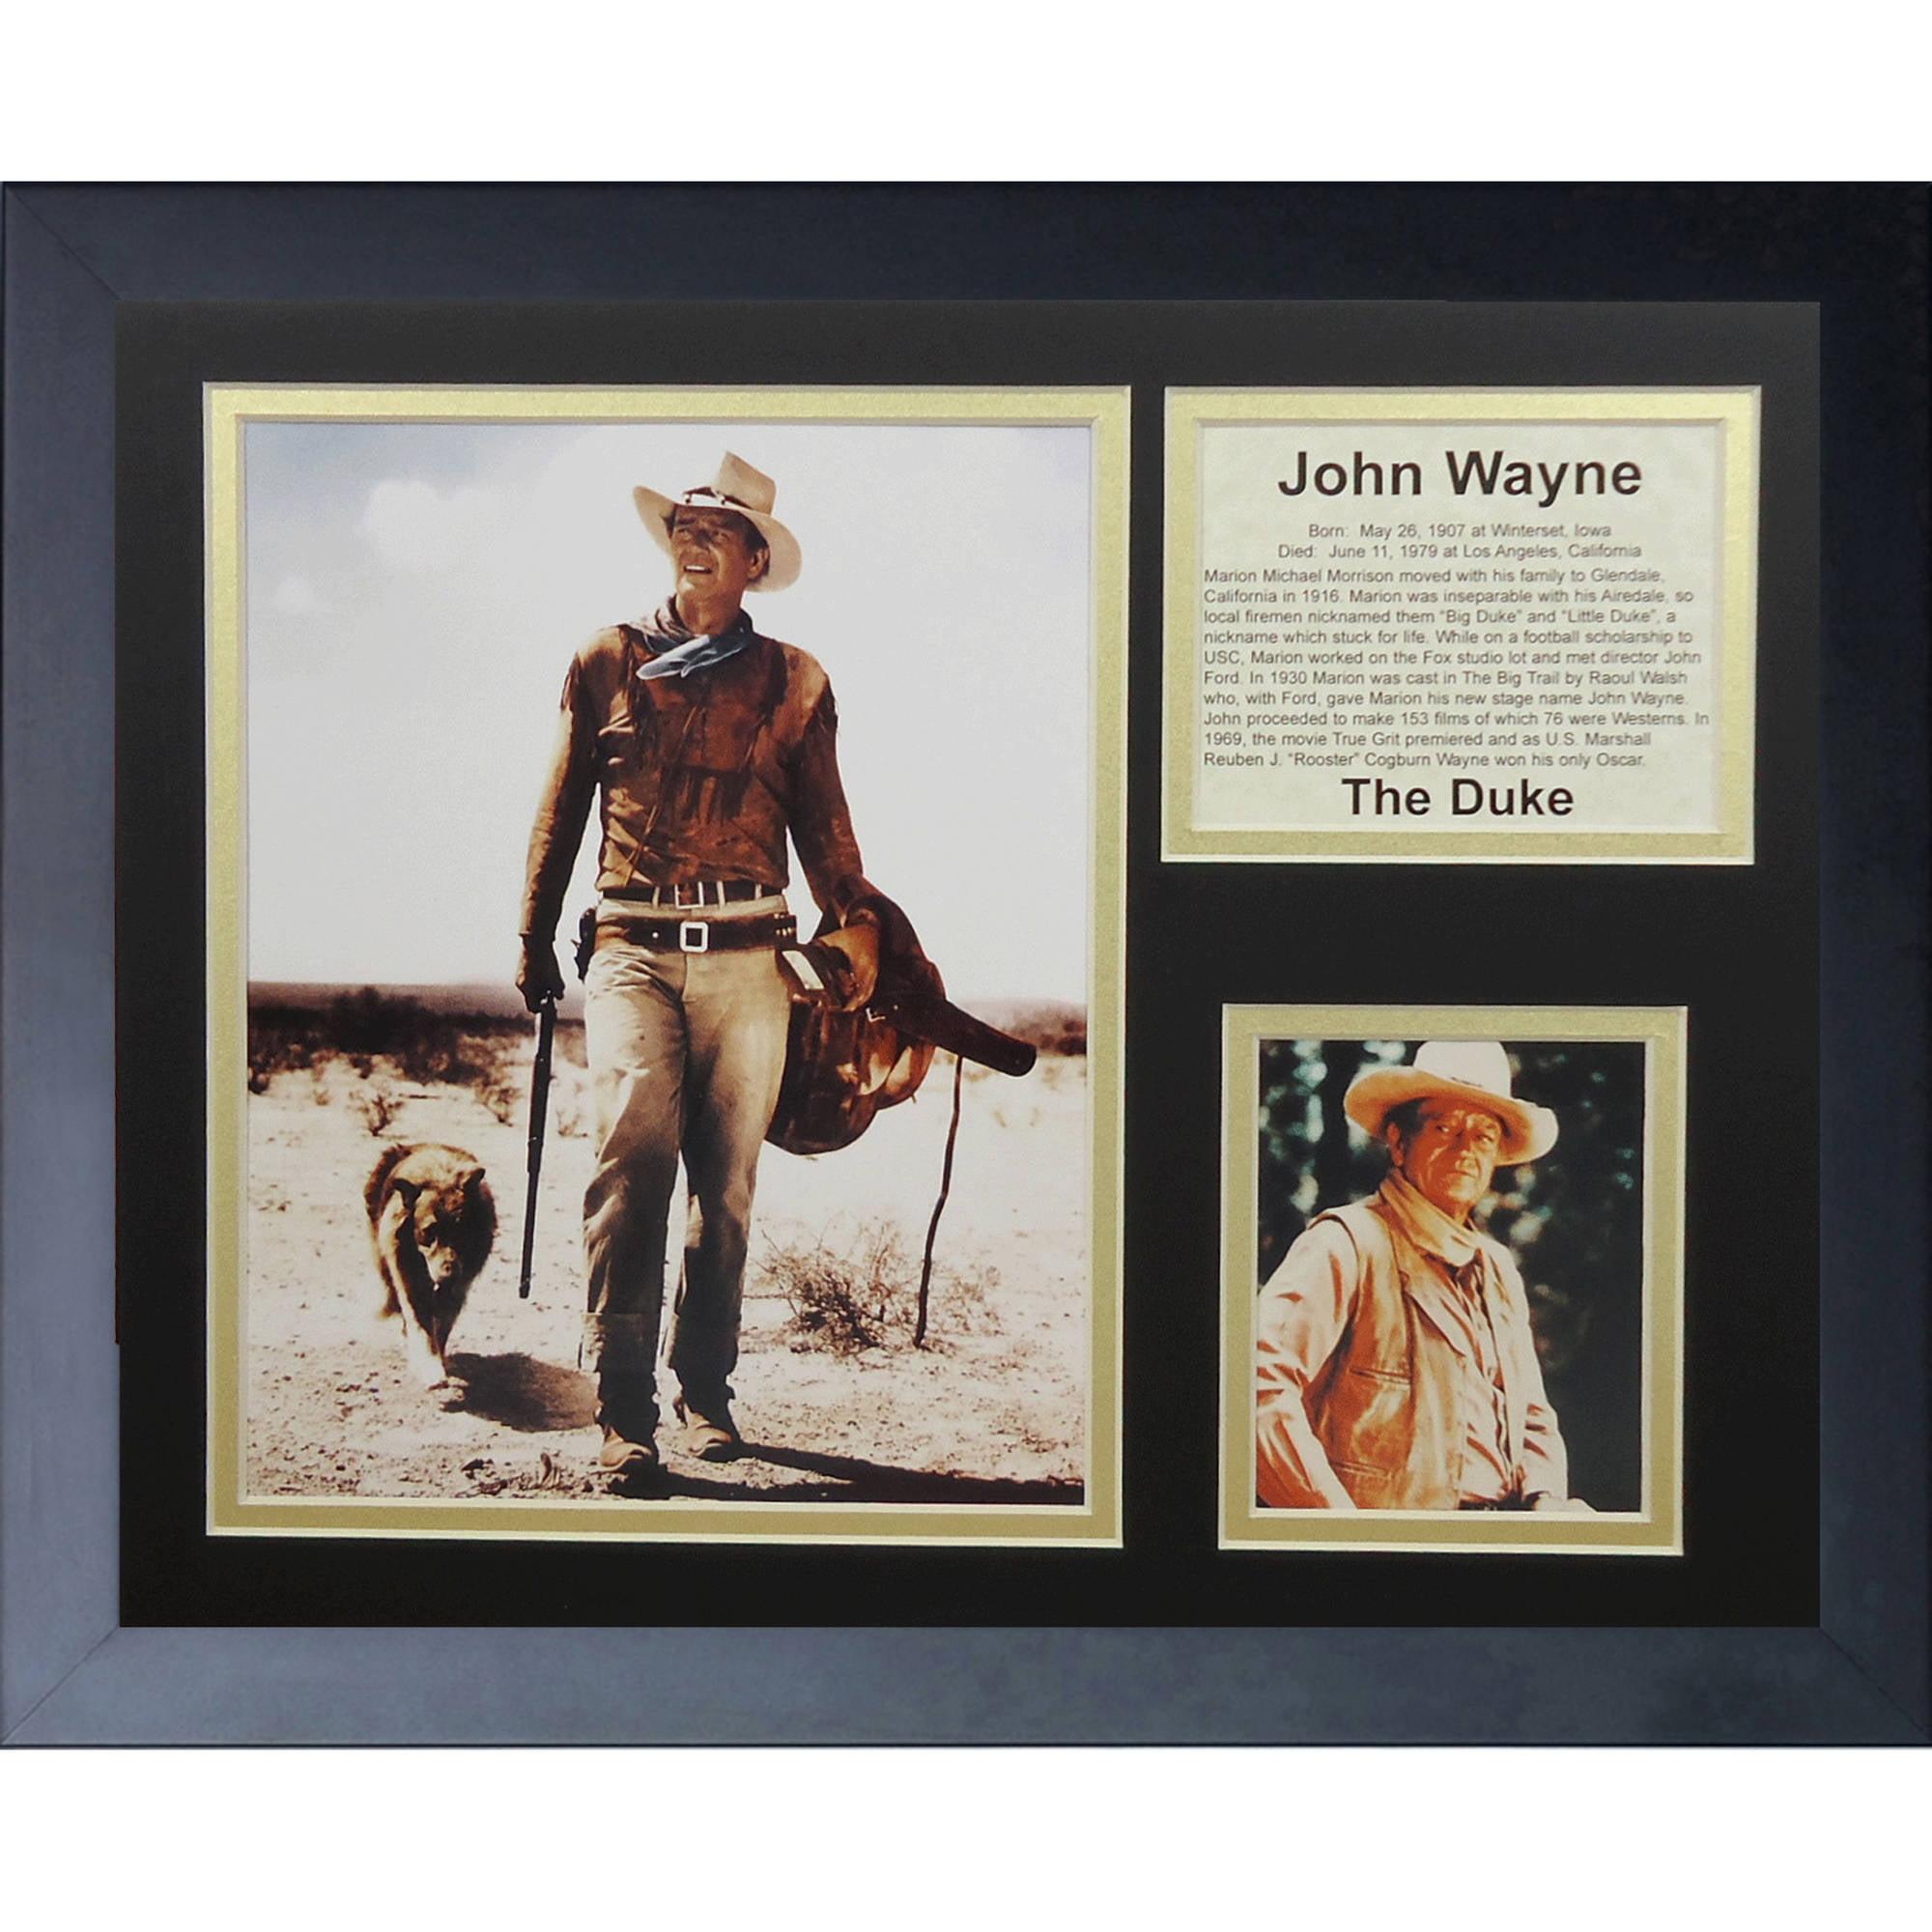 John Wayne Framed Photo Collage, 11x14, by Legends Never Die